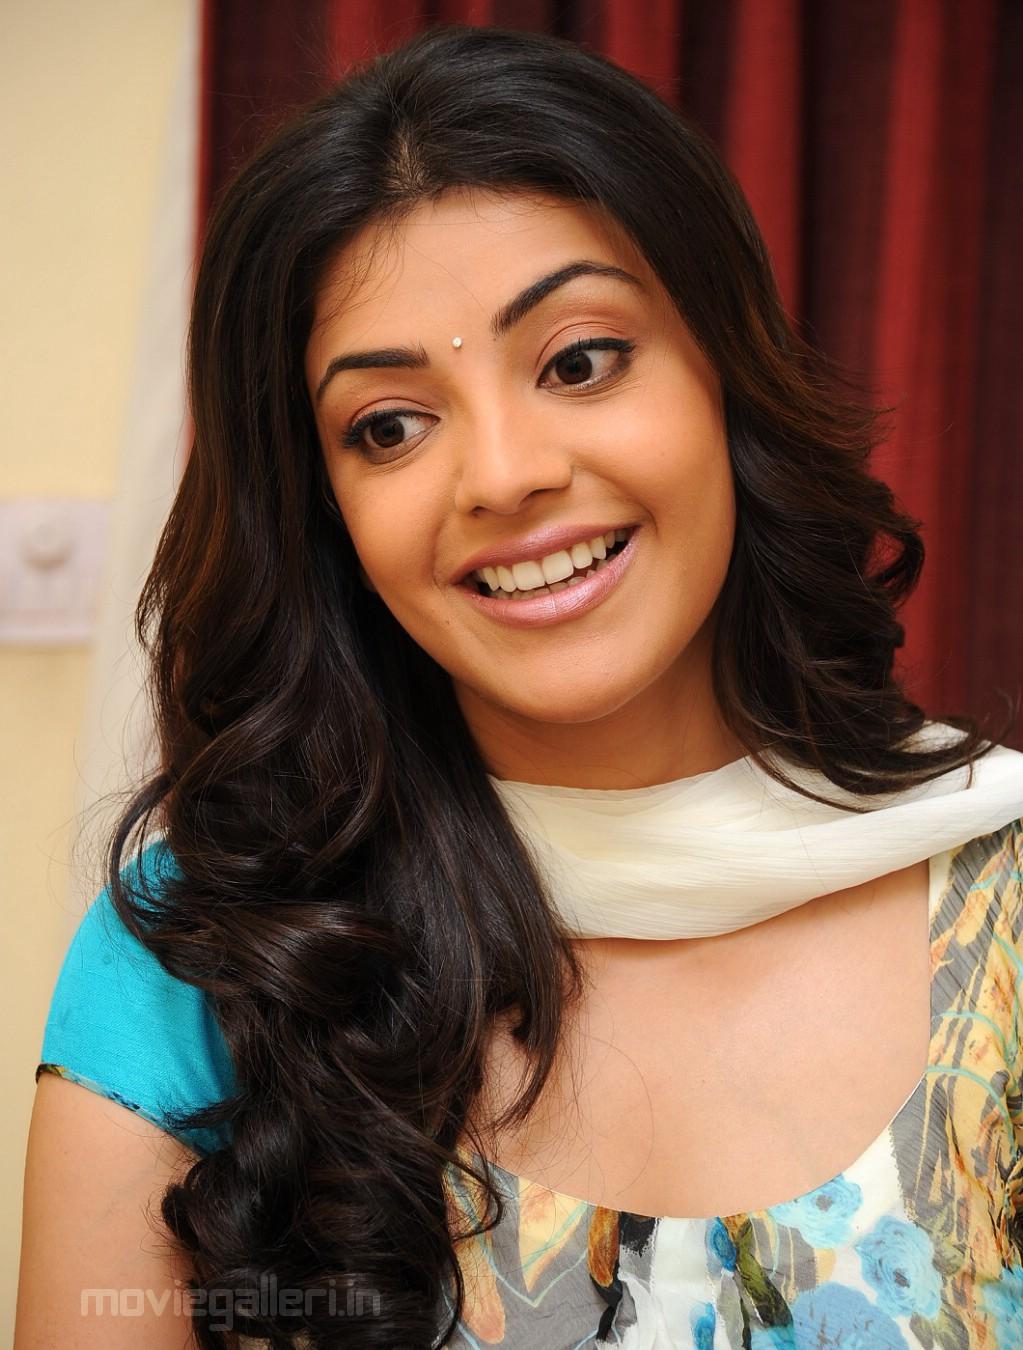 Kajal Agarwal Cute Pics - Babe - Reruscocom-7681